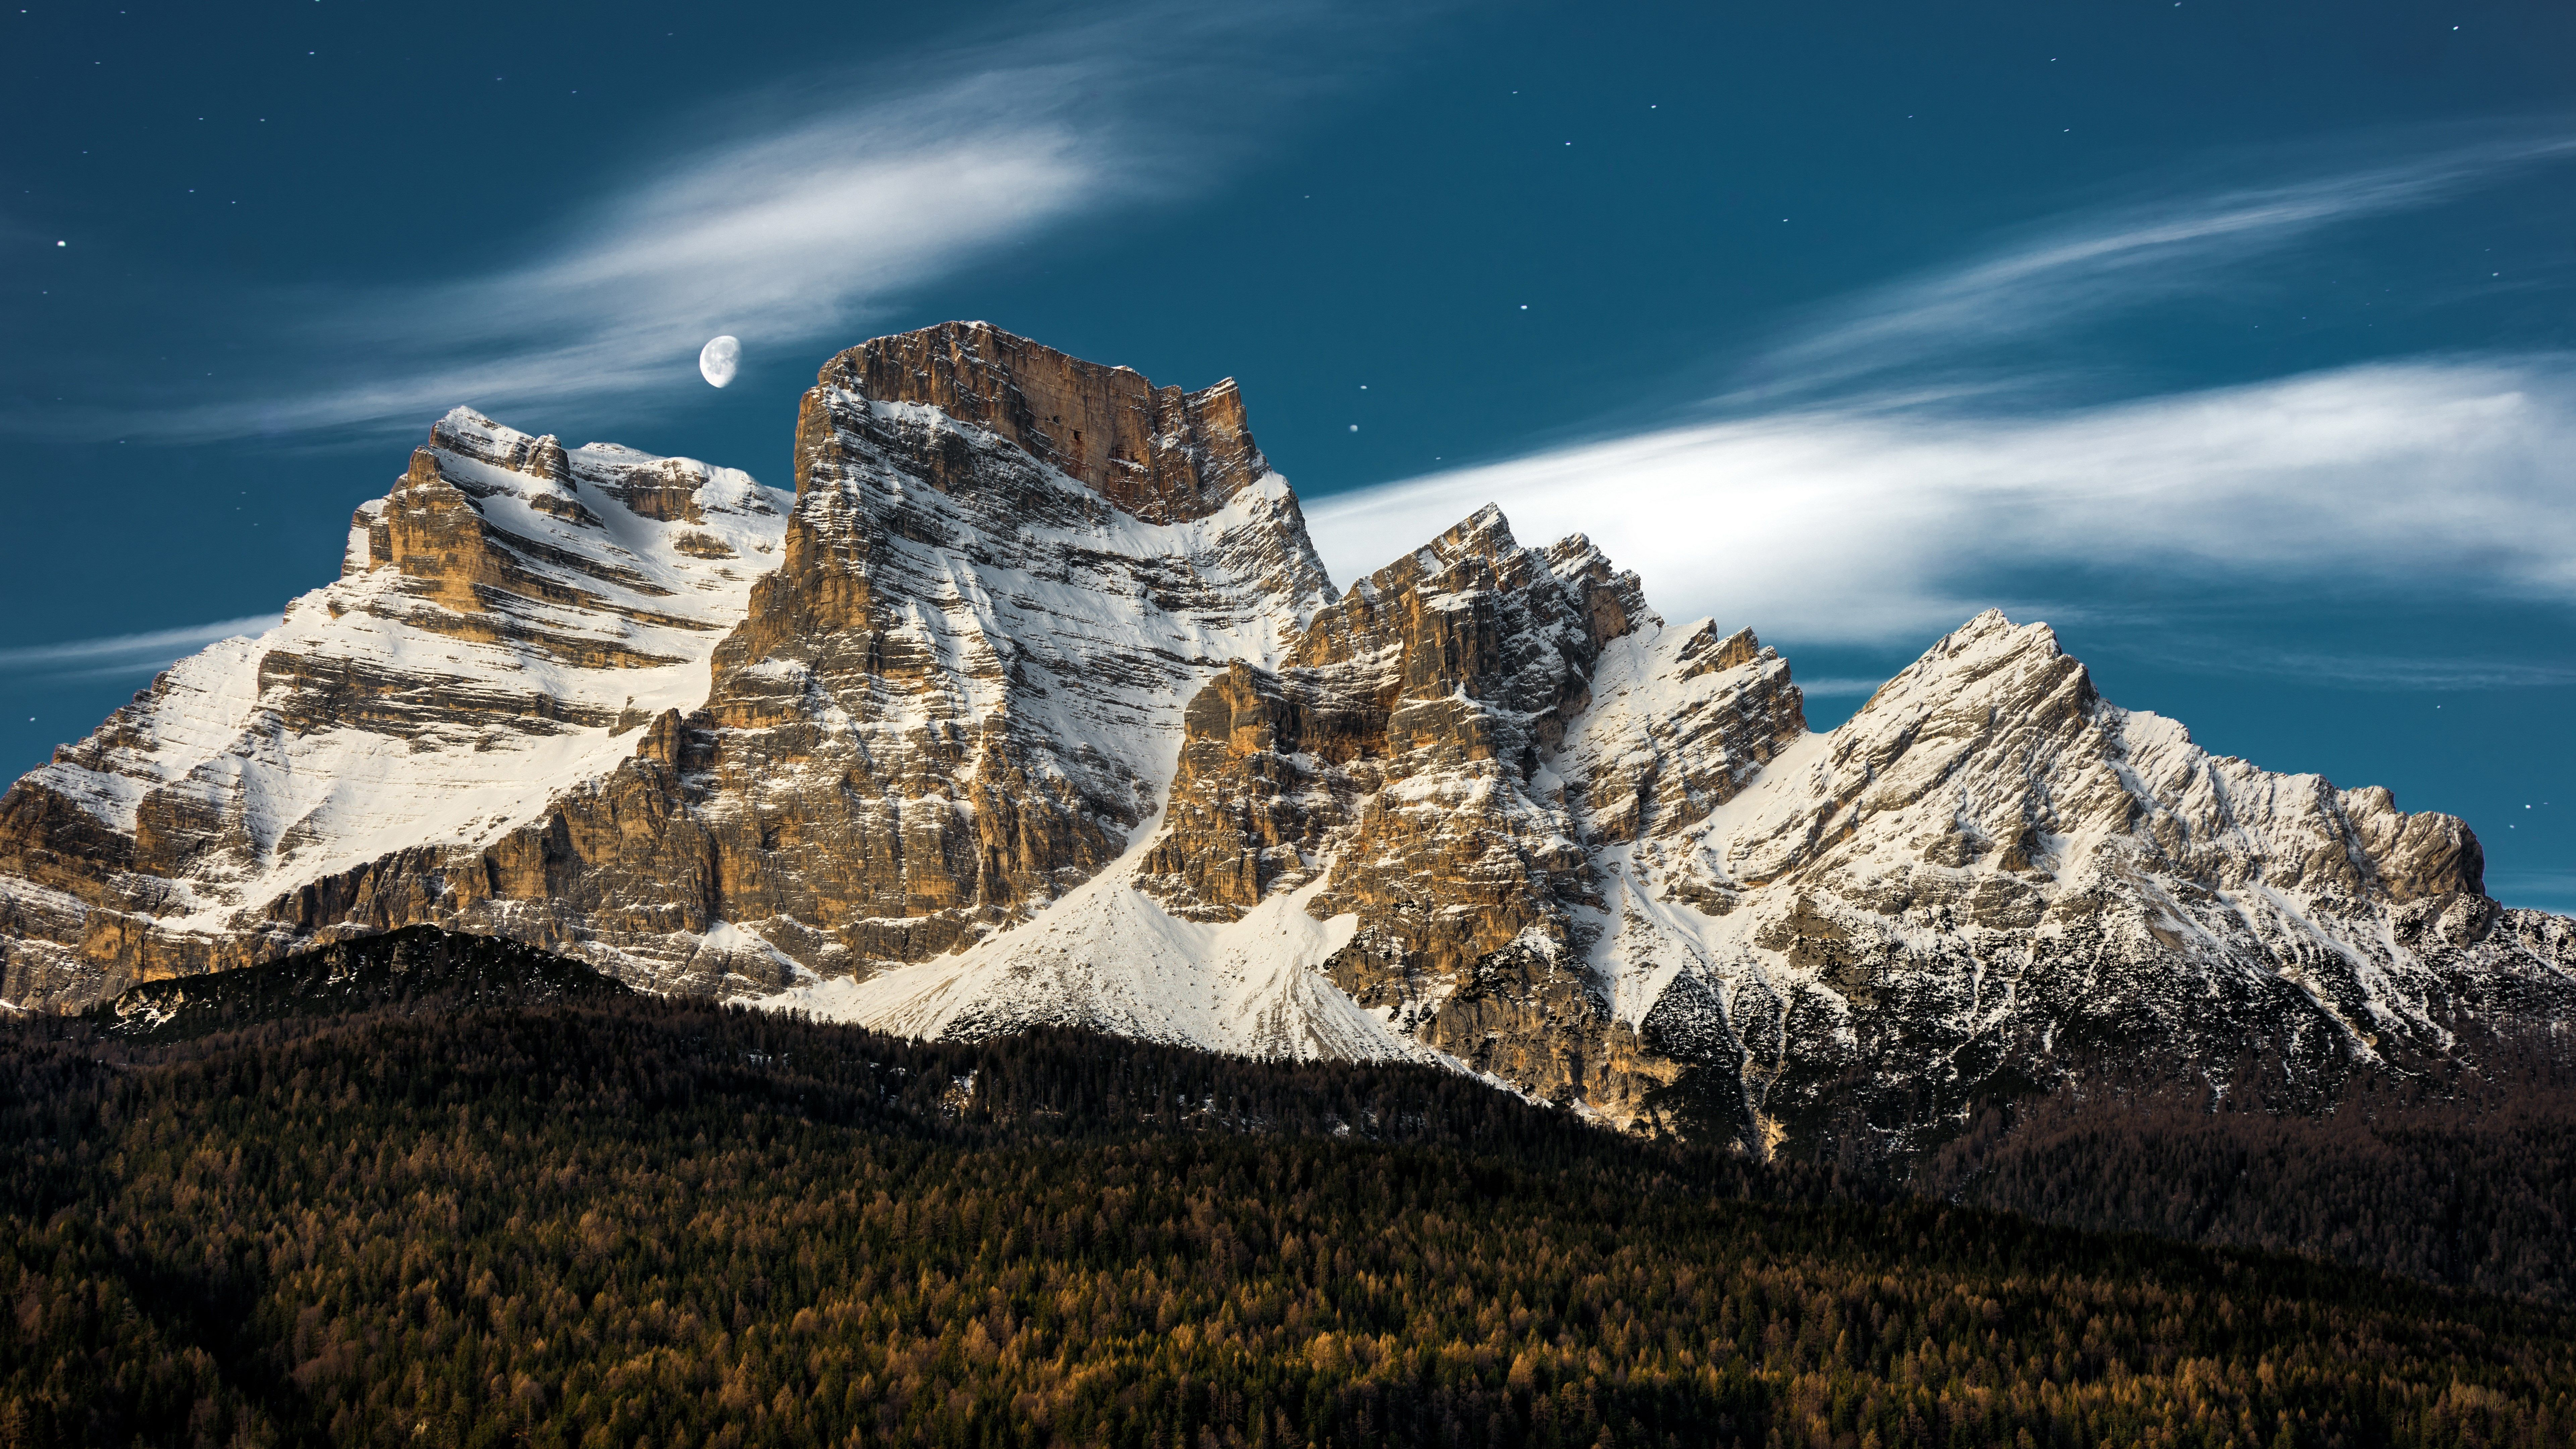 8k Wallpaper Nature Mountain